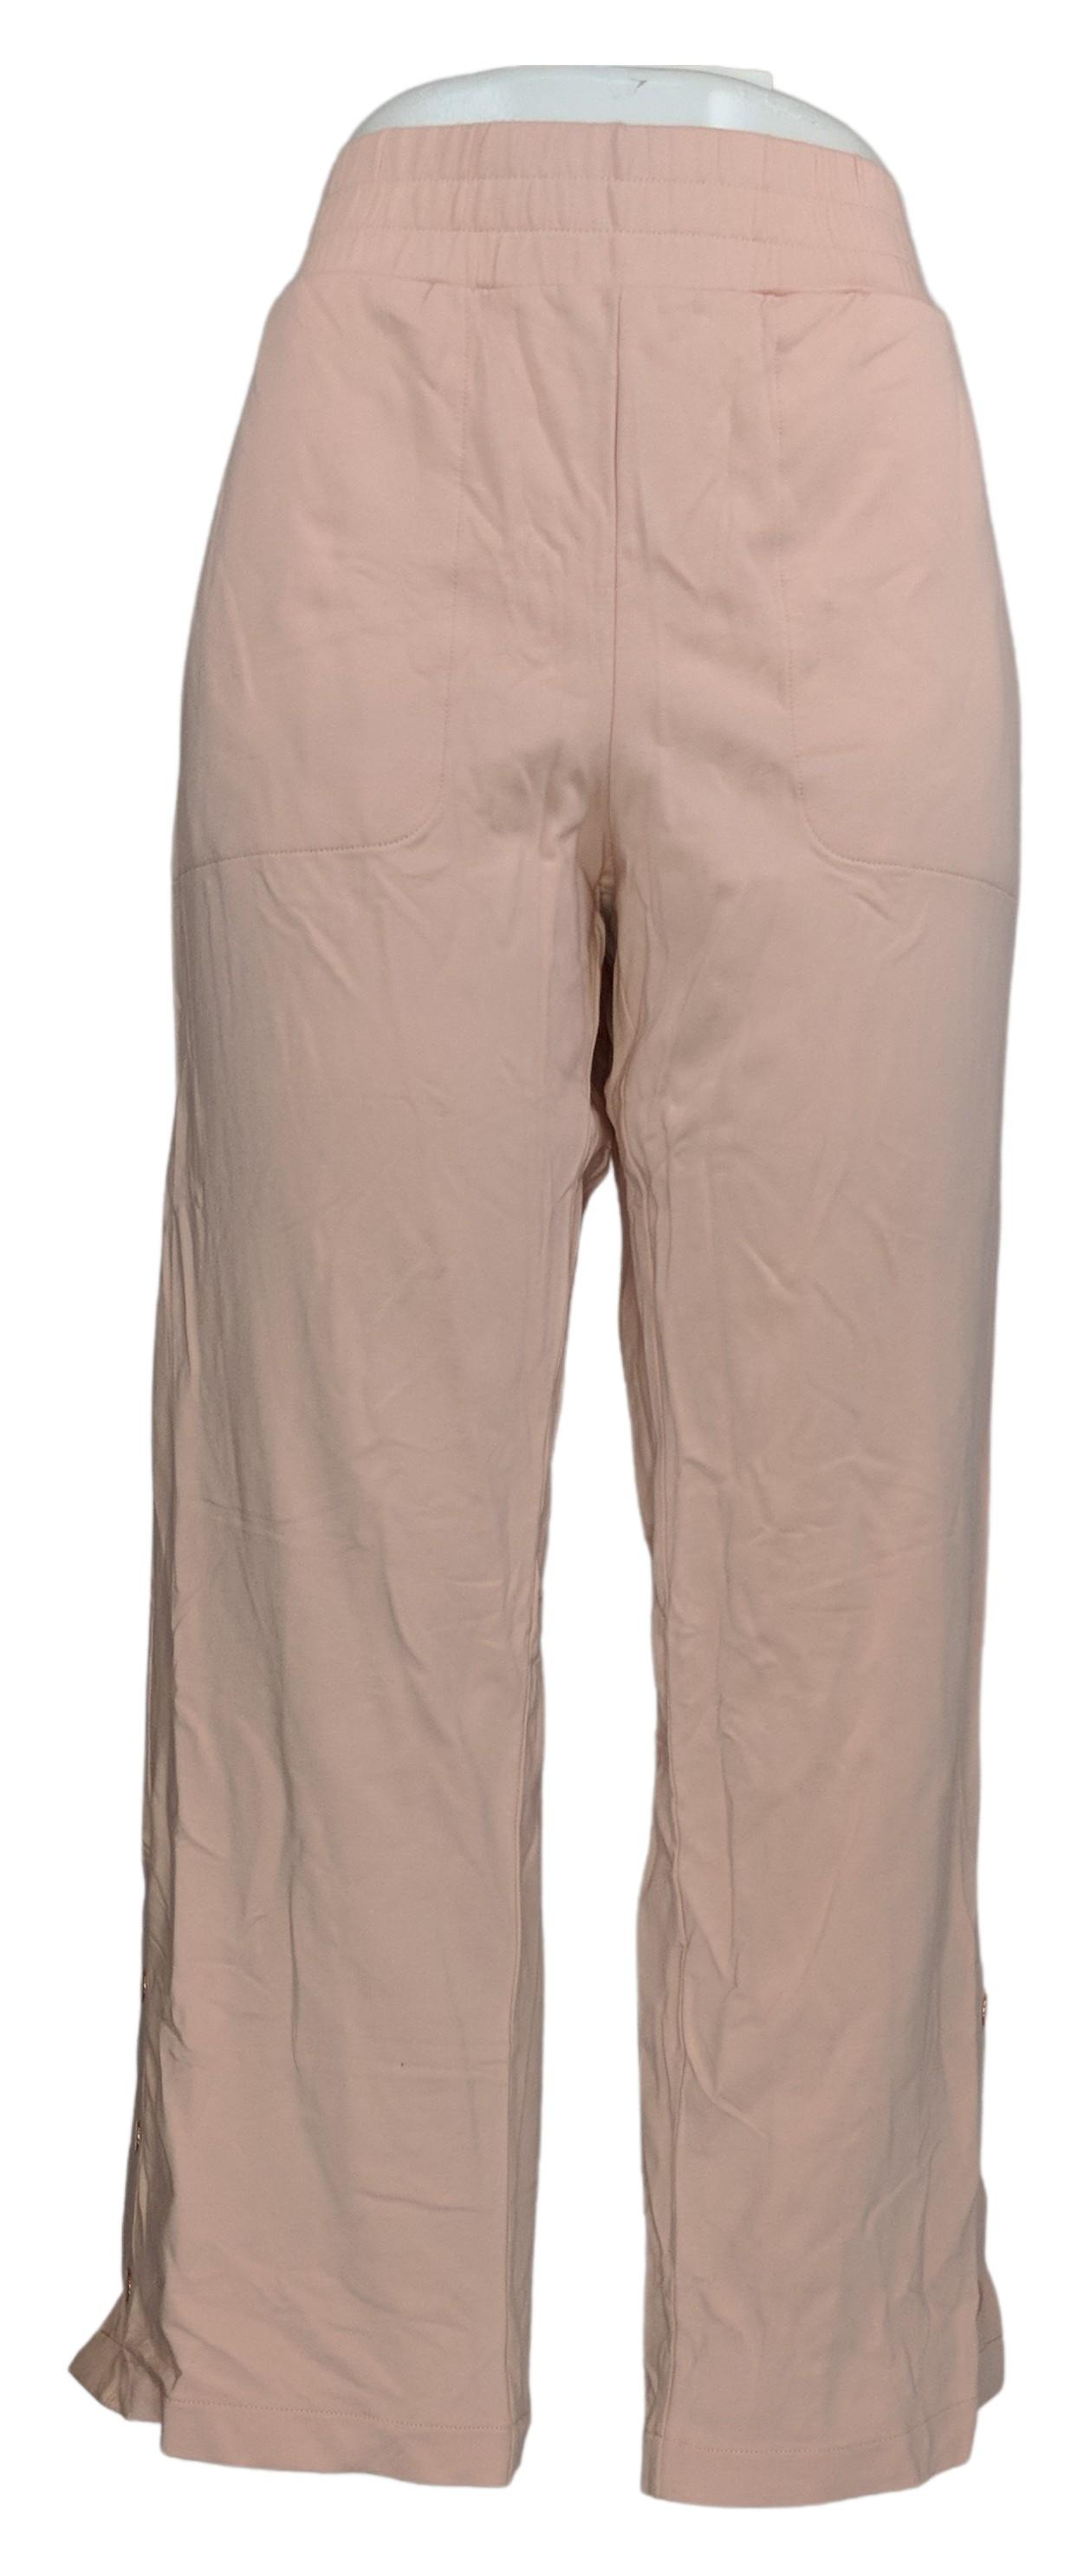 BP-46 French Terry Stylish Moto Pants